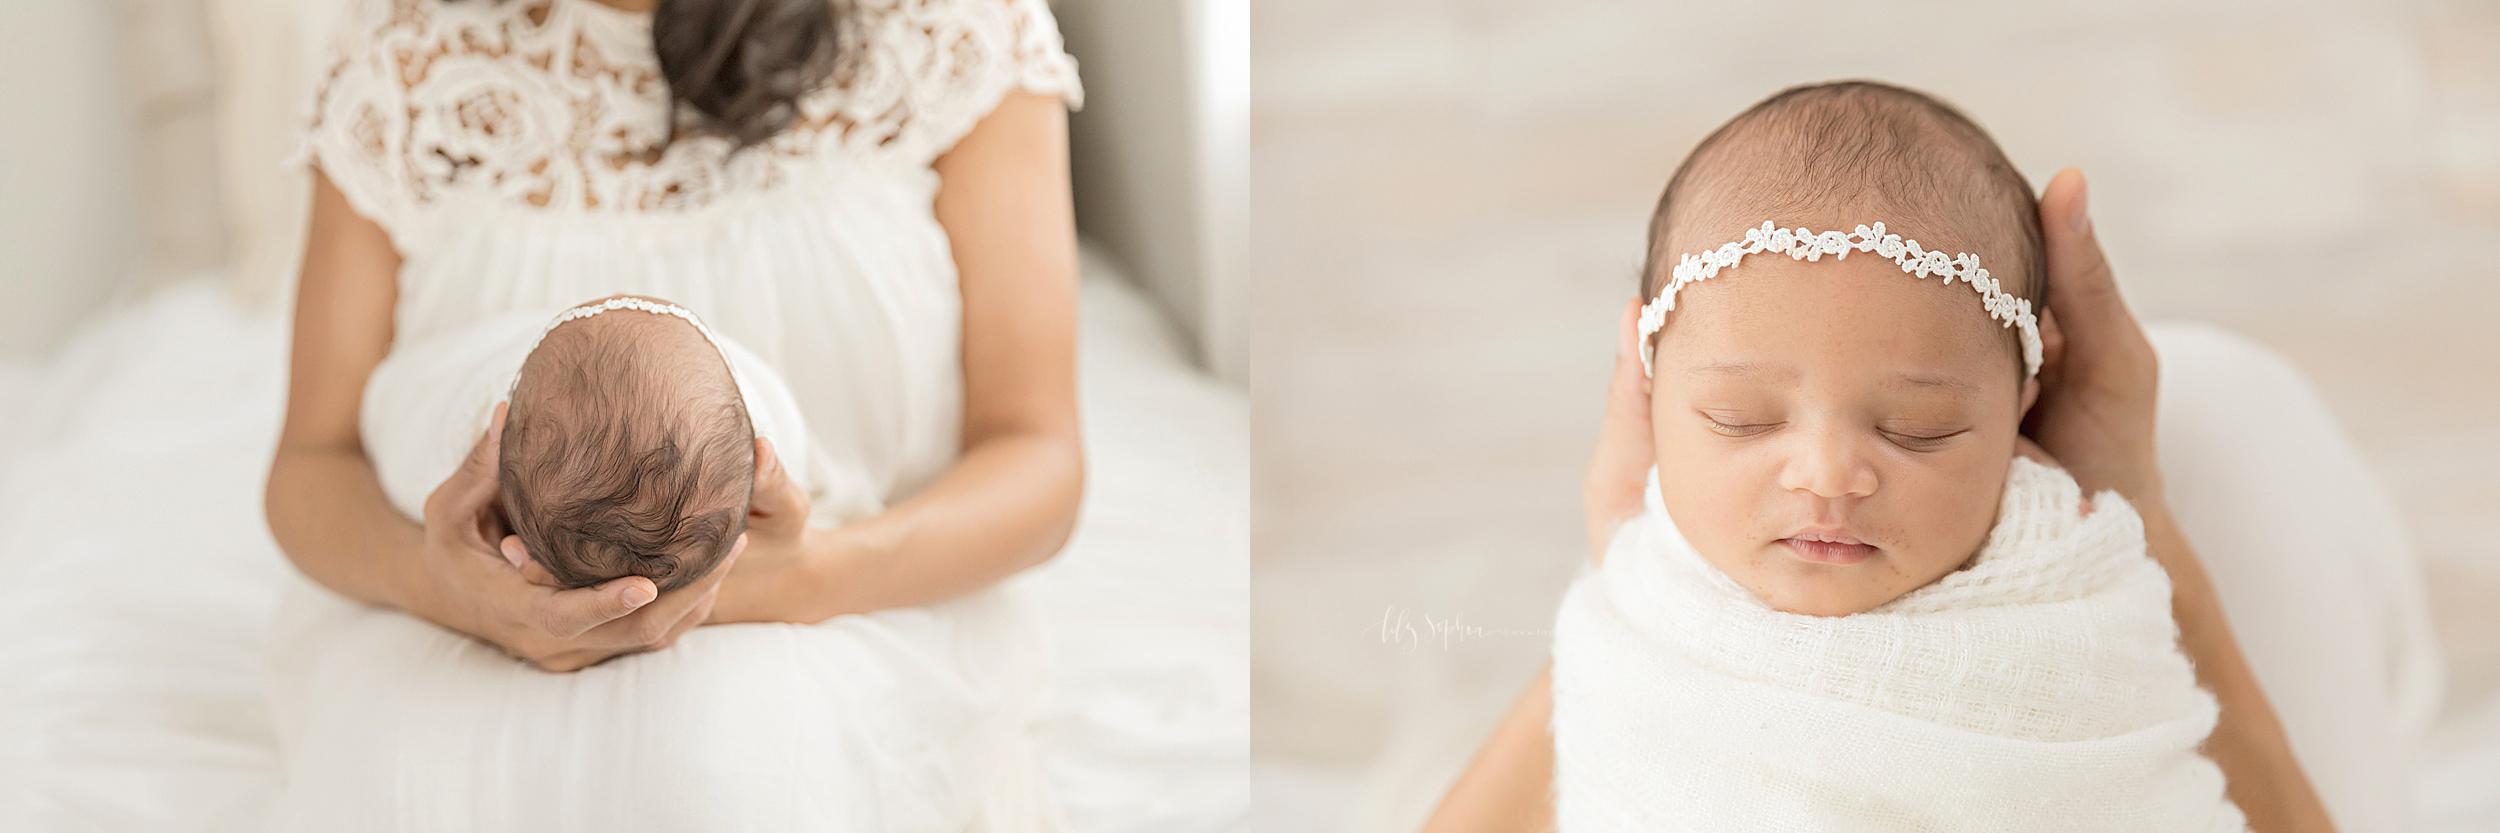 atlanta-midtown-brookhaven-decatur-lily-sophia-photography-photographer-portraits-grant-park-family-studio-newborn-baby-girl-big-brothers_0115.jpg